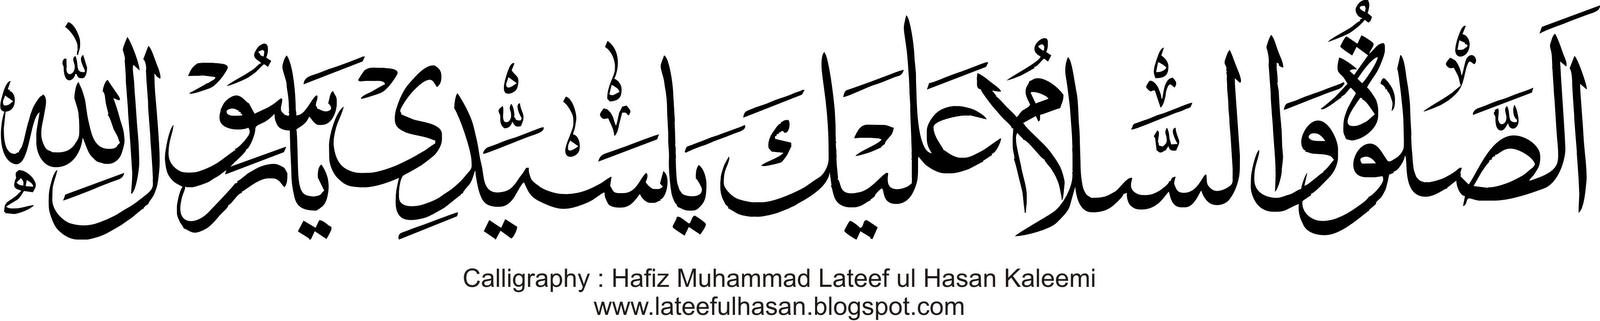 Computer Learning Tutorials In Urdu Khattati Calligraphy